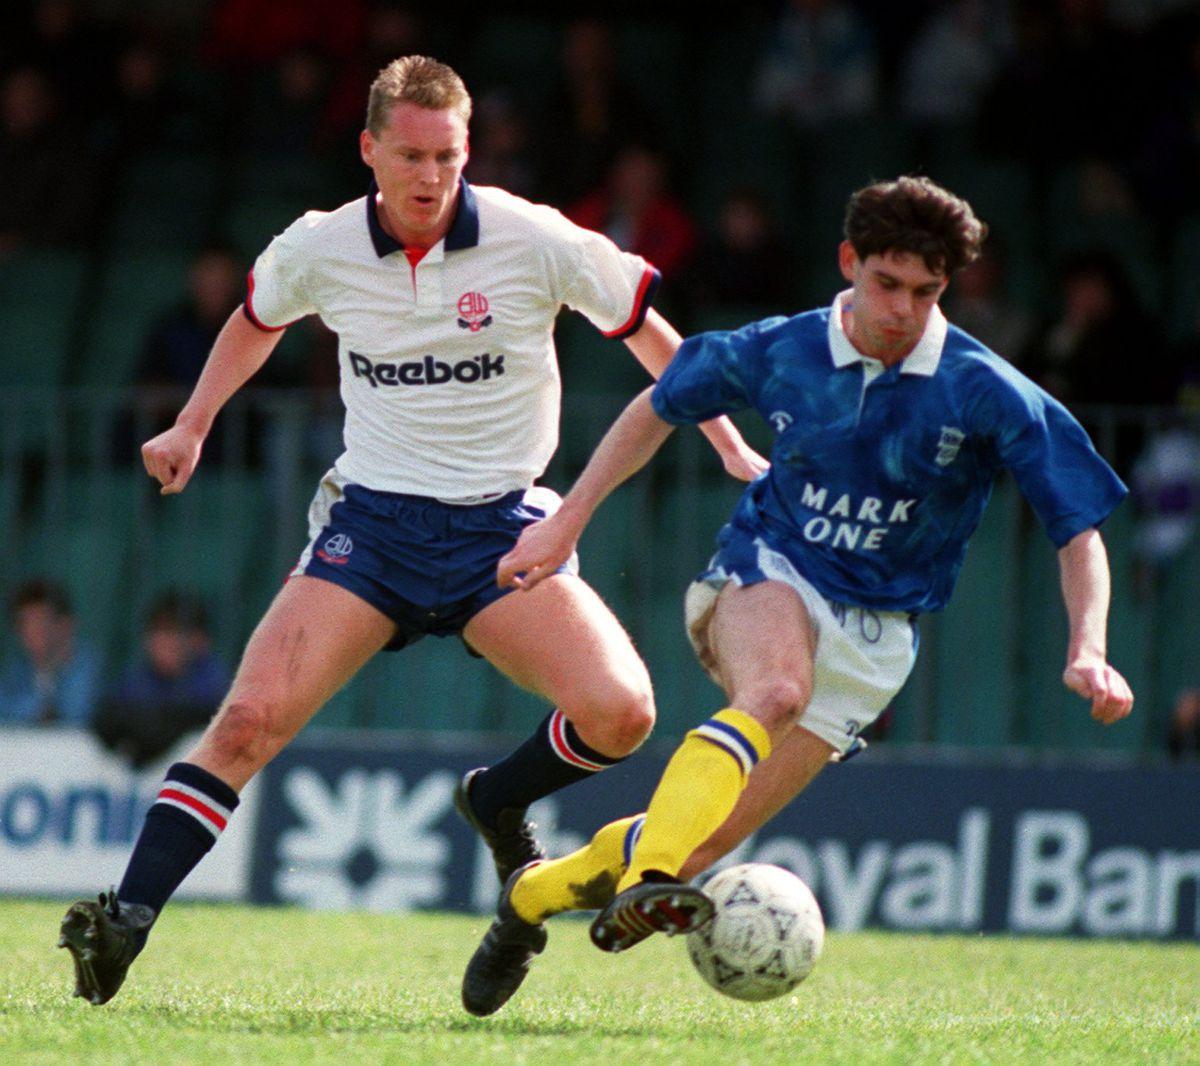 Soccer - Barclays League Division Three - Bolton Wanderers v Birmingham City - Burnden Park